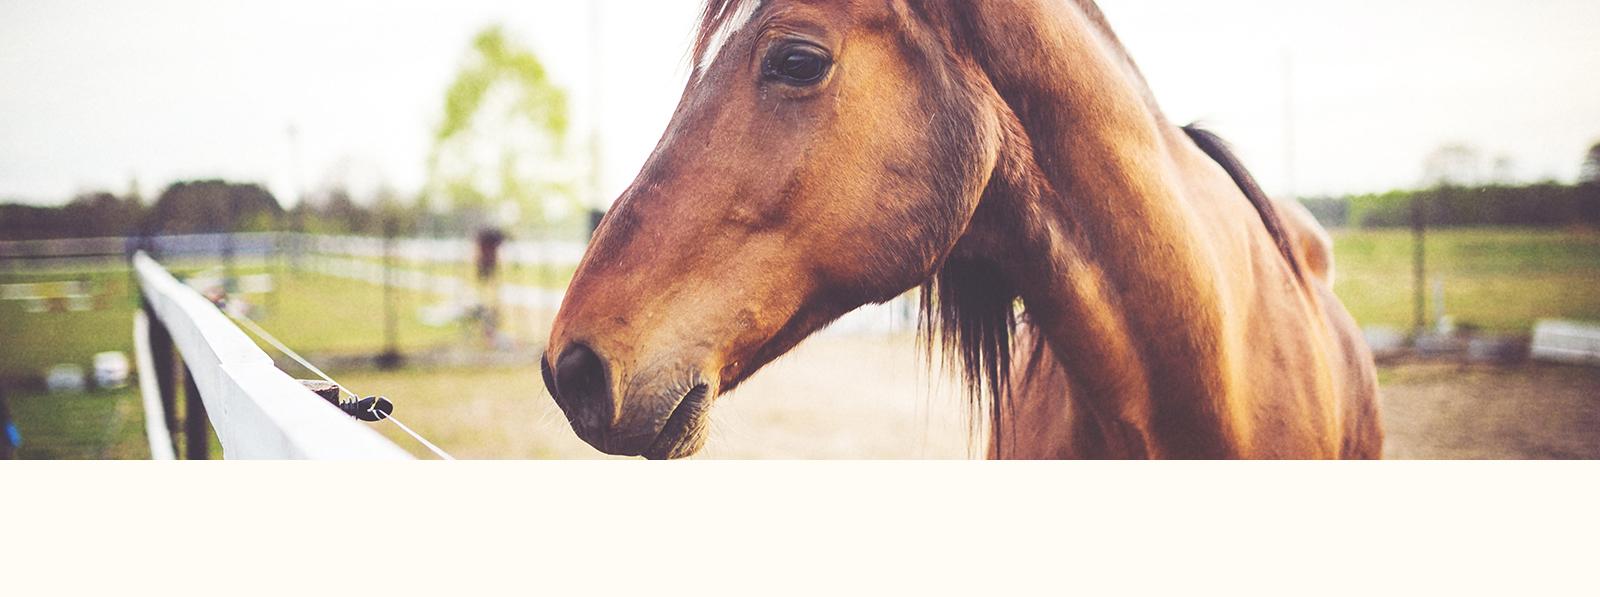 Clínica ambulante de caballos